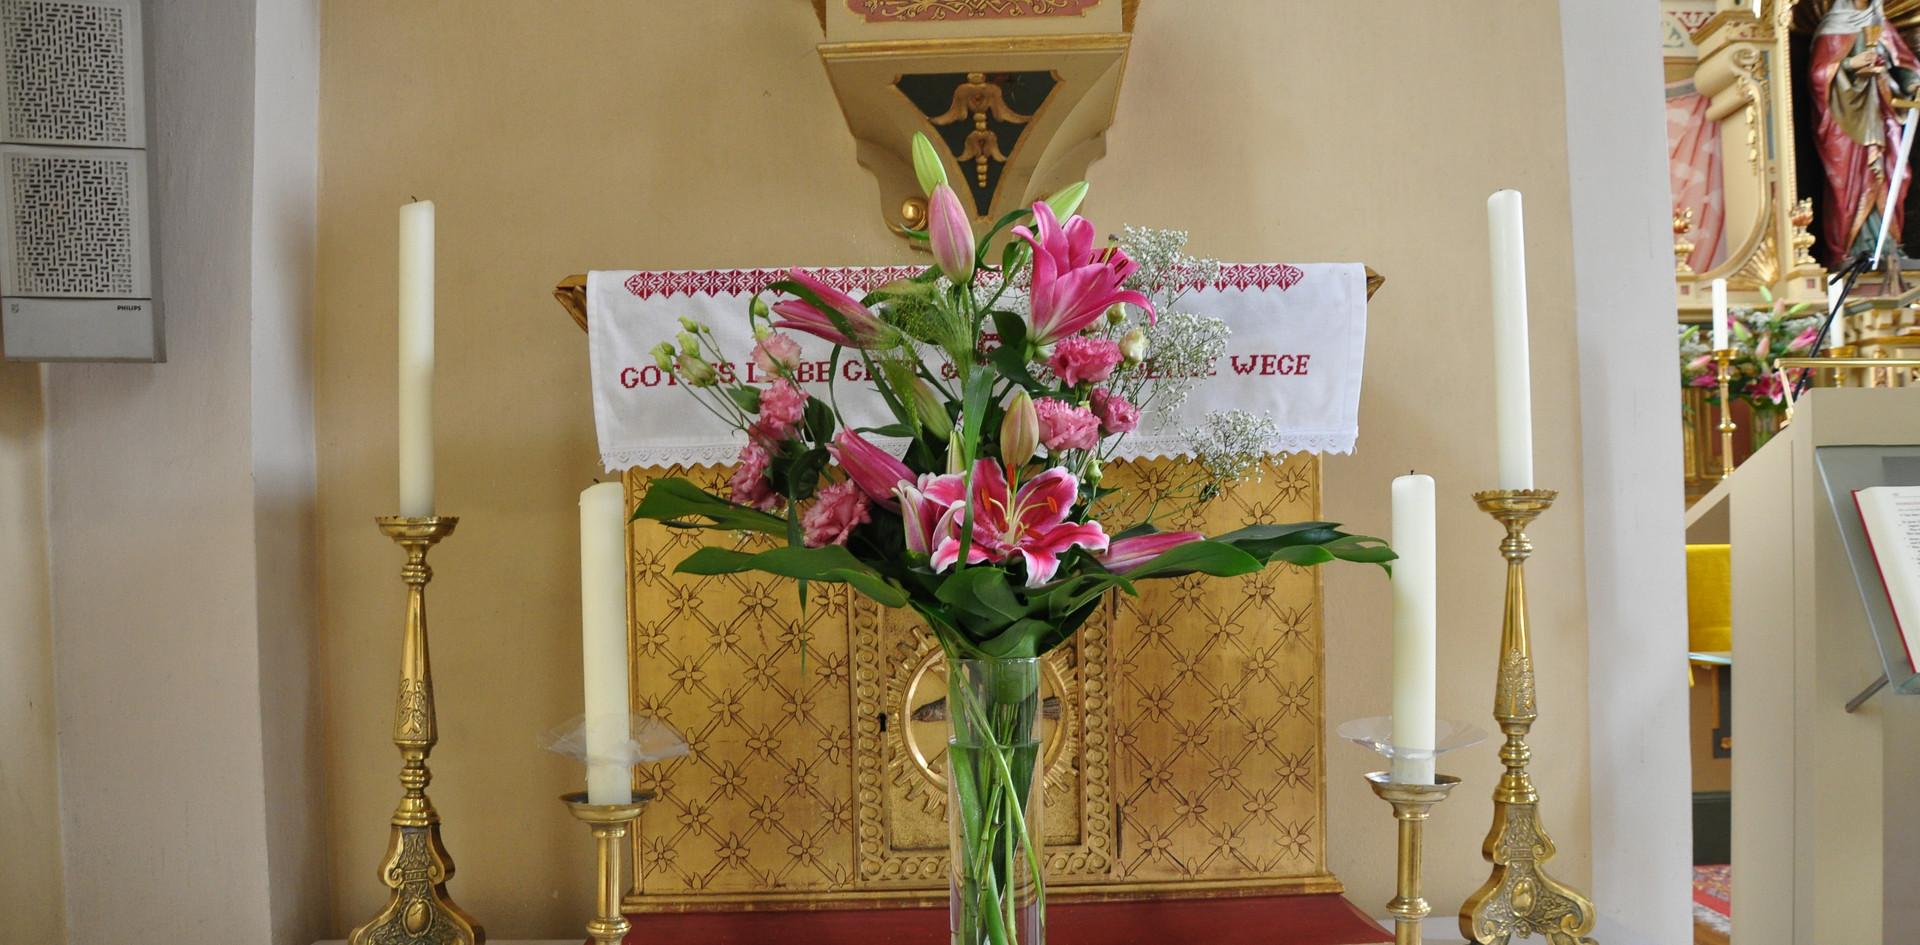 Kirche Blumendeko